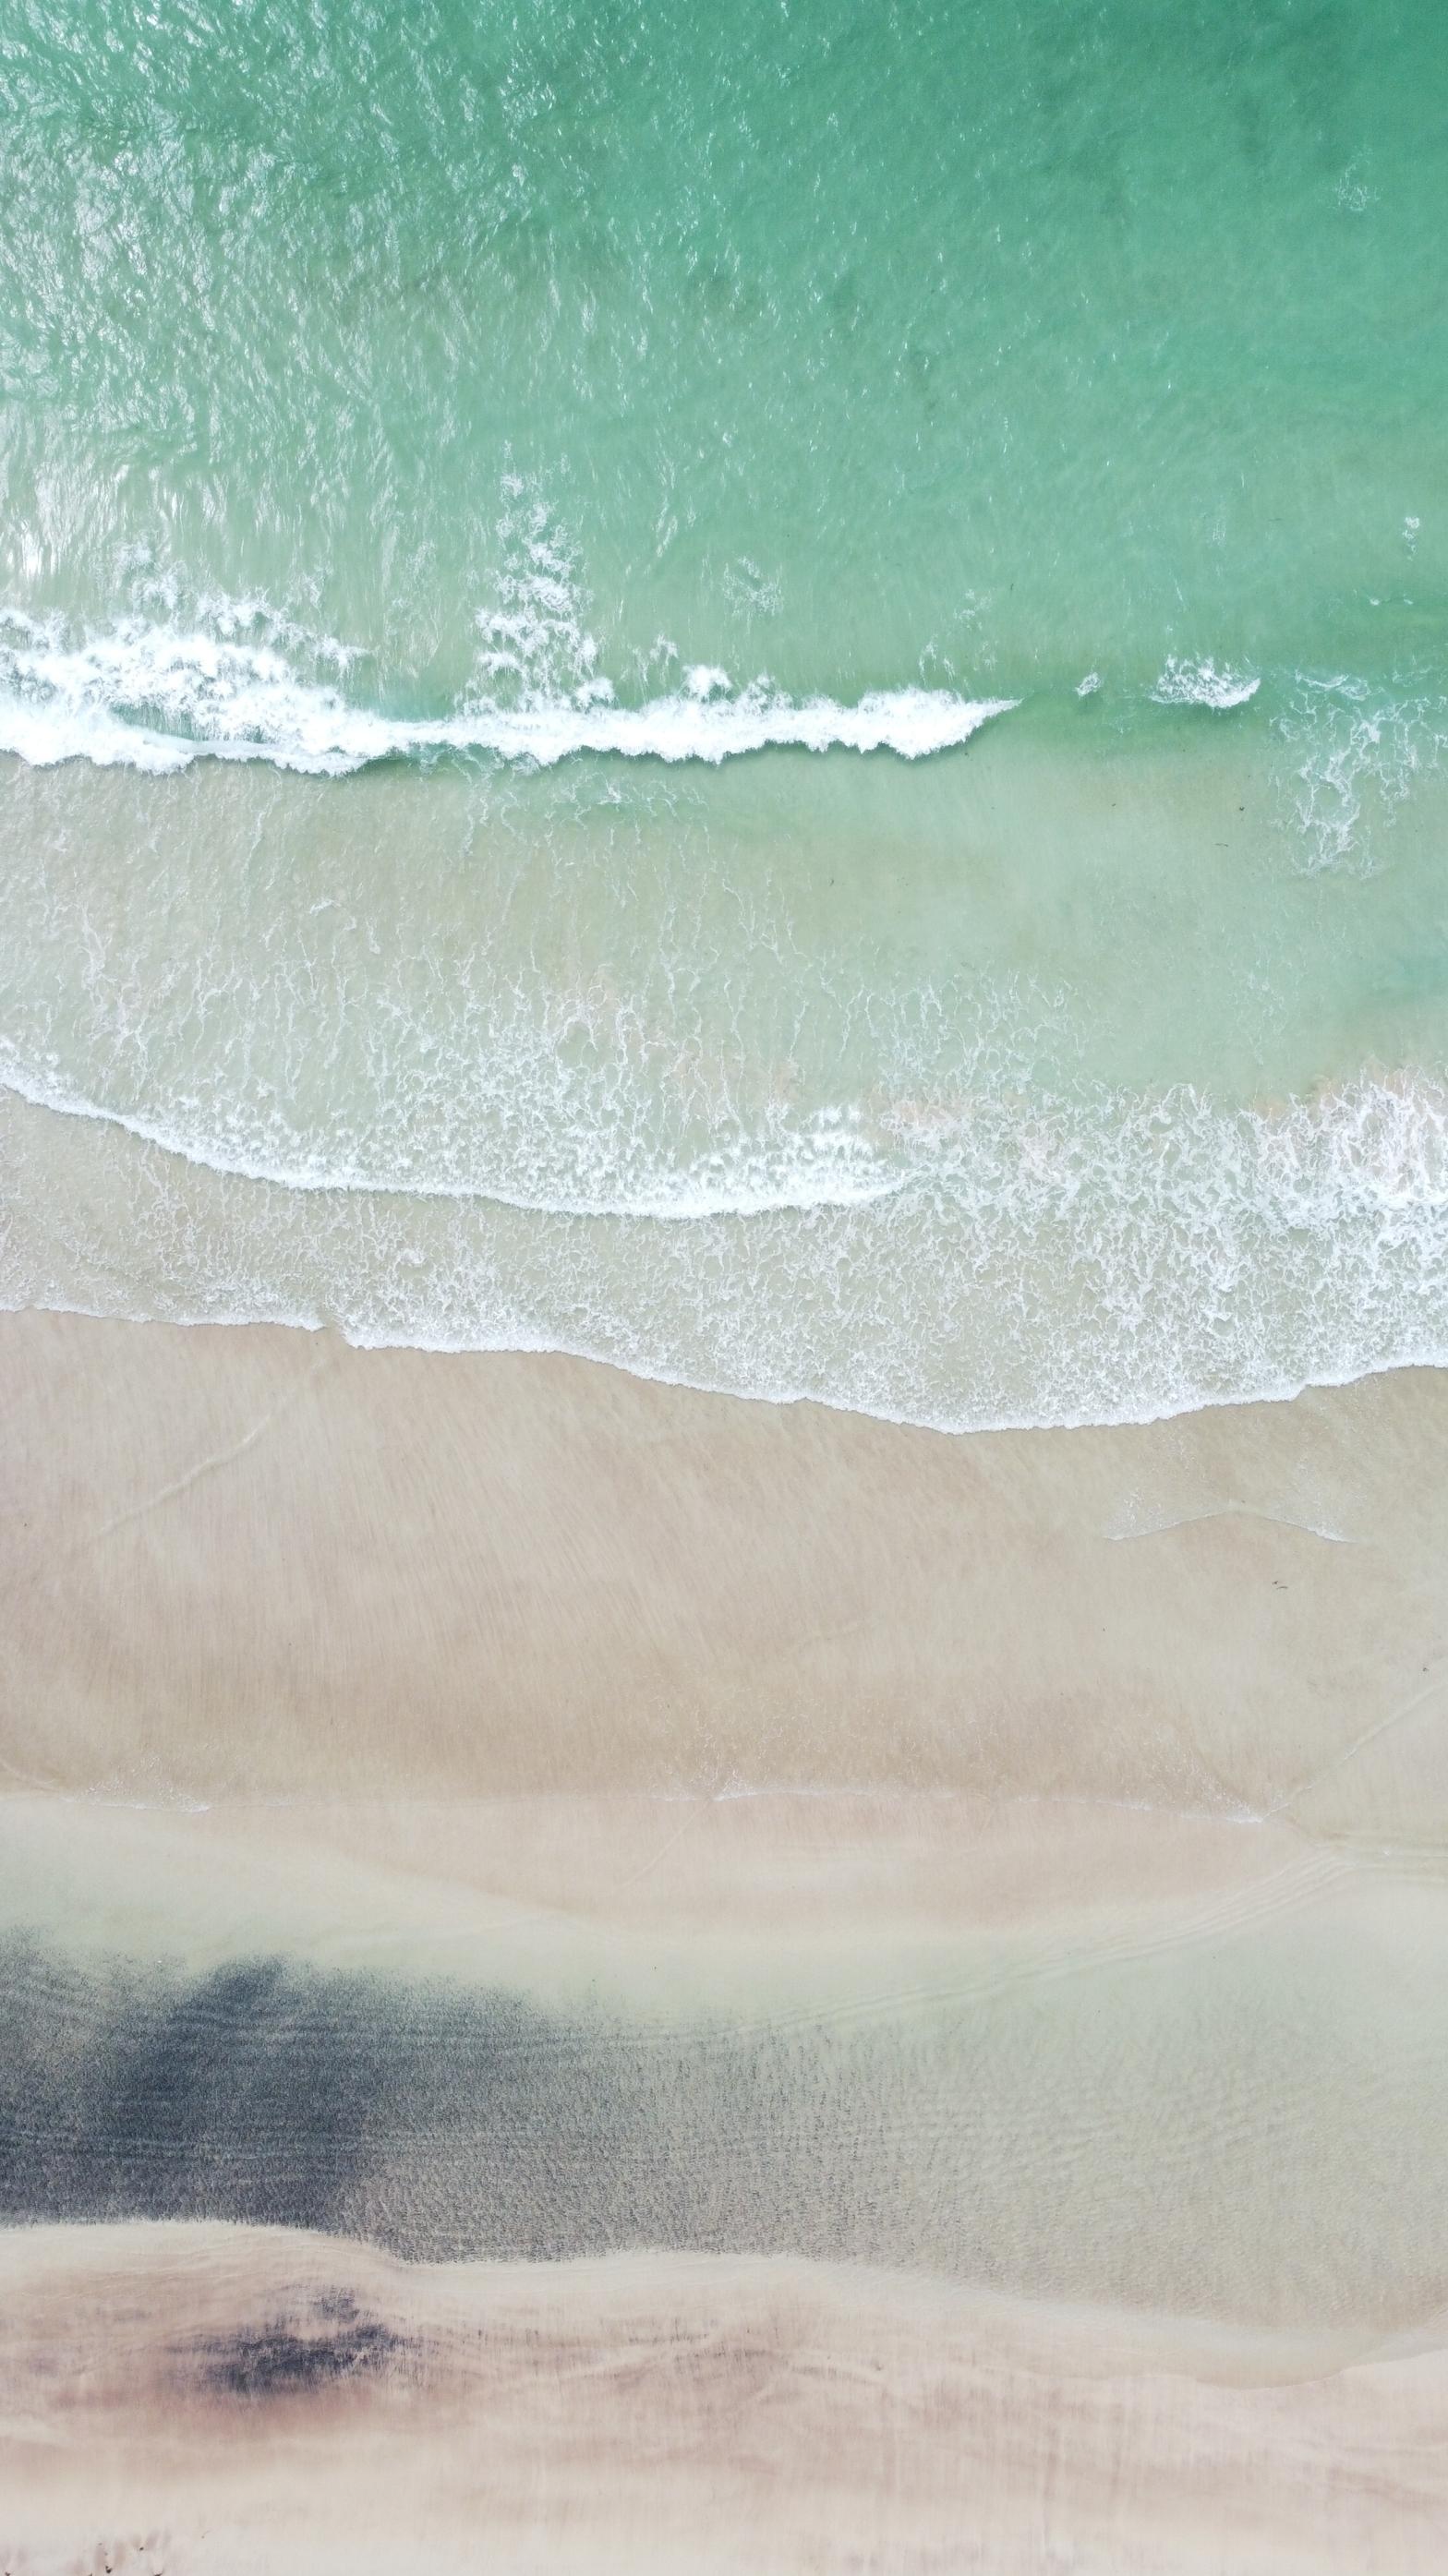 White sand scottish beach. Clear water. Blue Water. Aerial photo of a beach near Sandwood Bay, Scotland. By Sam Davis Photographer. Drone operator. Professional Photographer. www.samsphotogallery.com